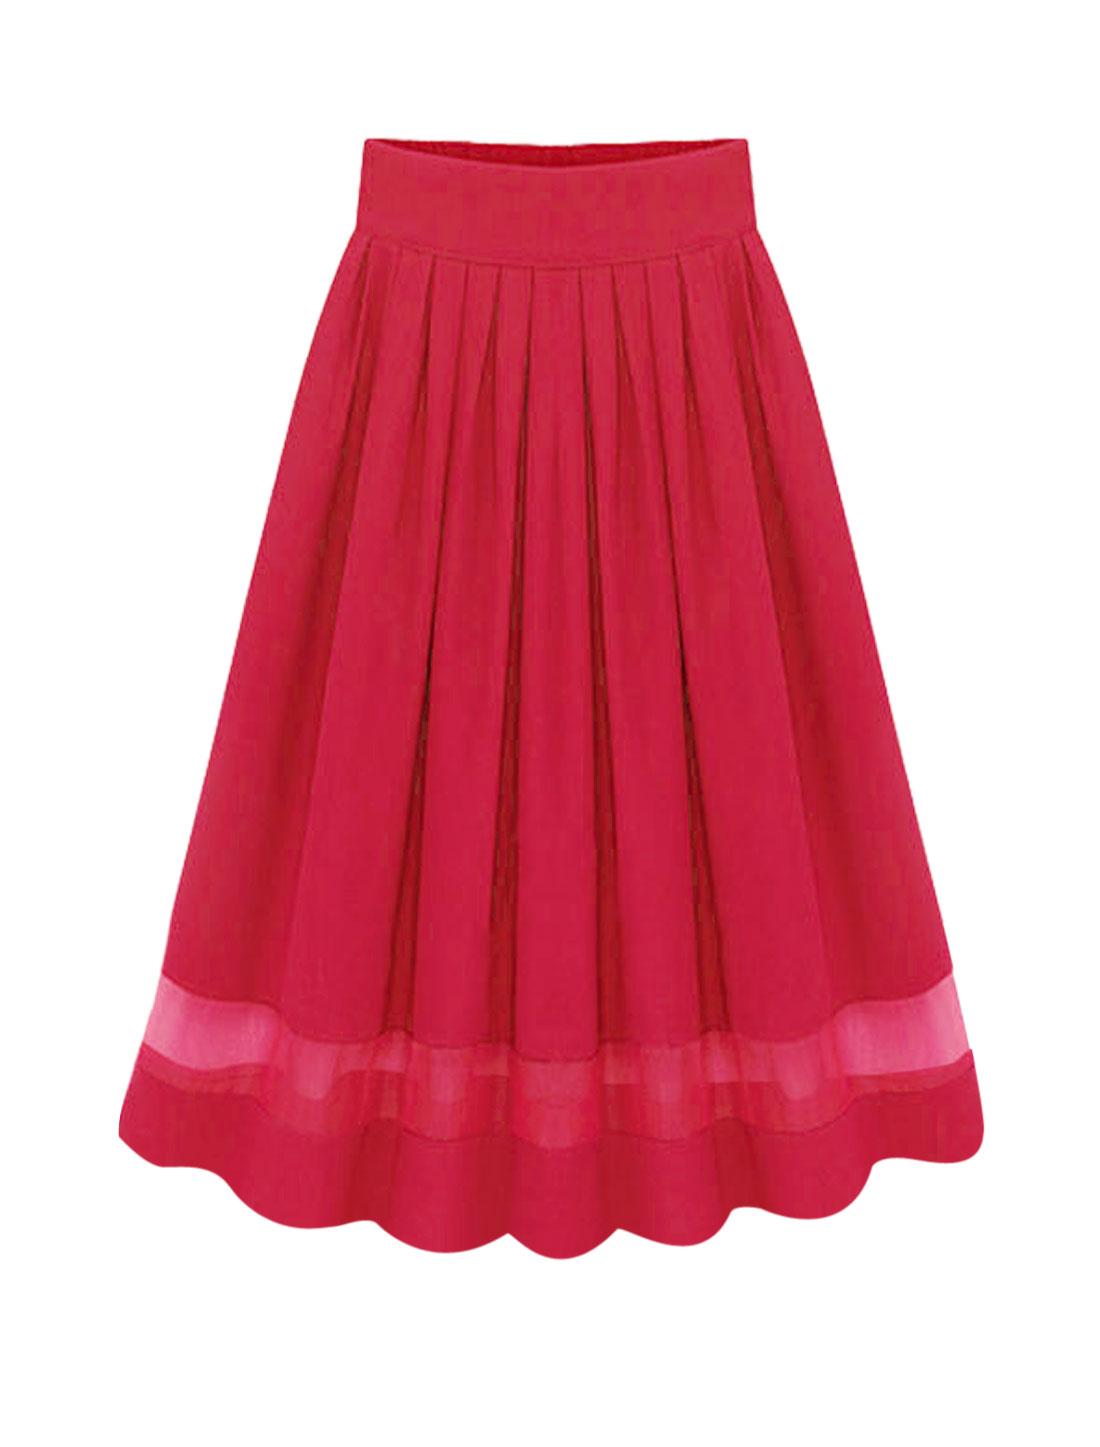 Woman Organza Panel Partially Lined High Waist Chiffon Skirt Fuchsia M